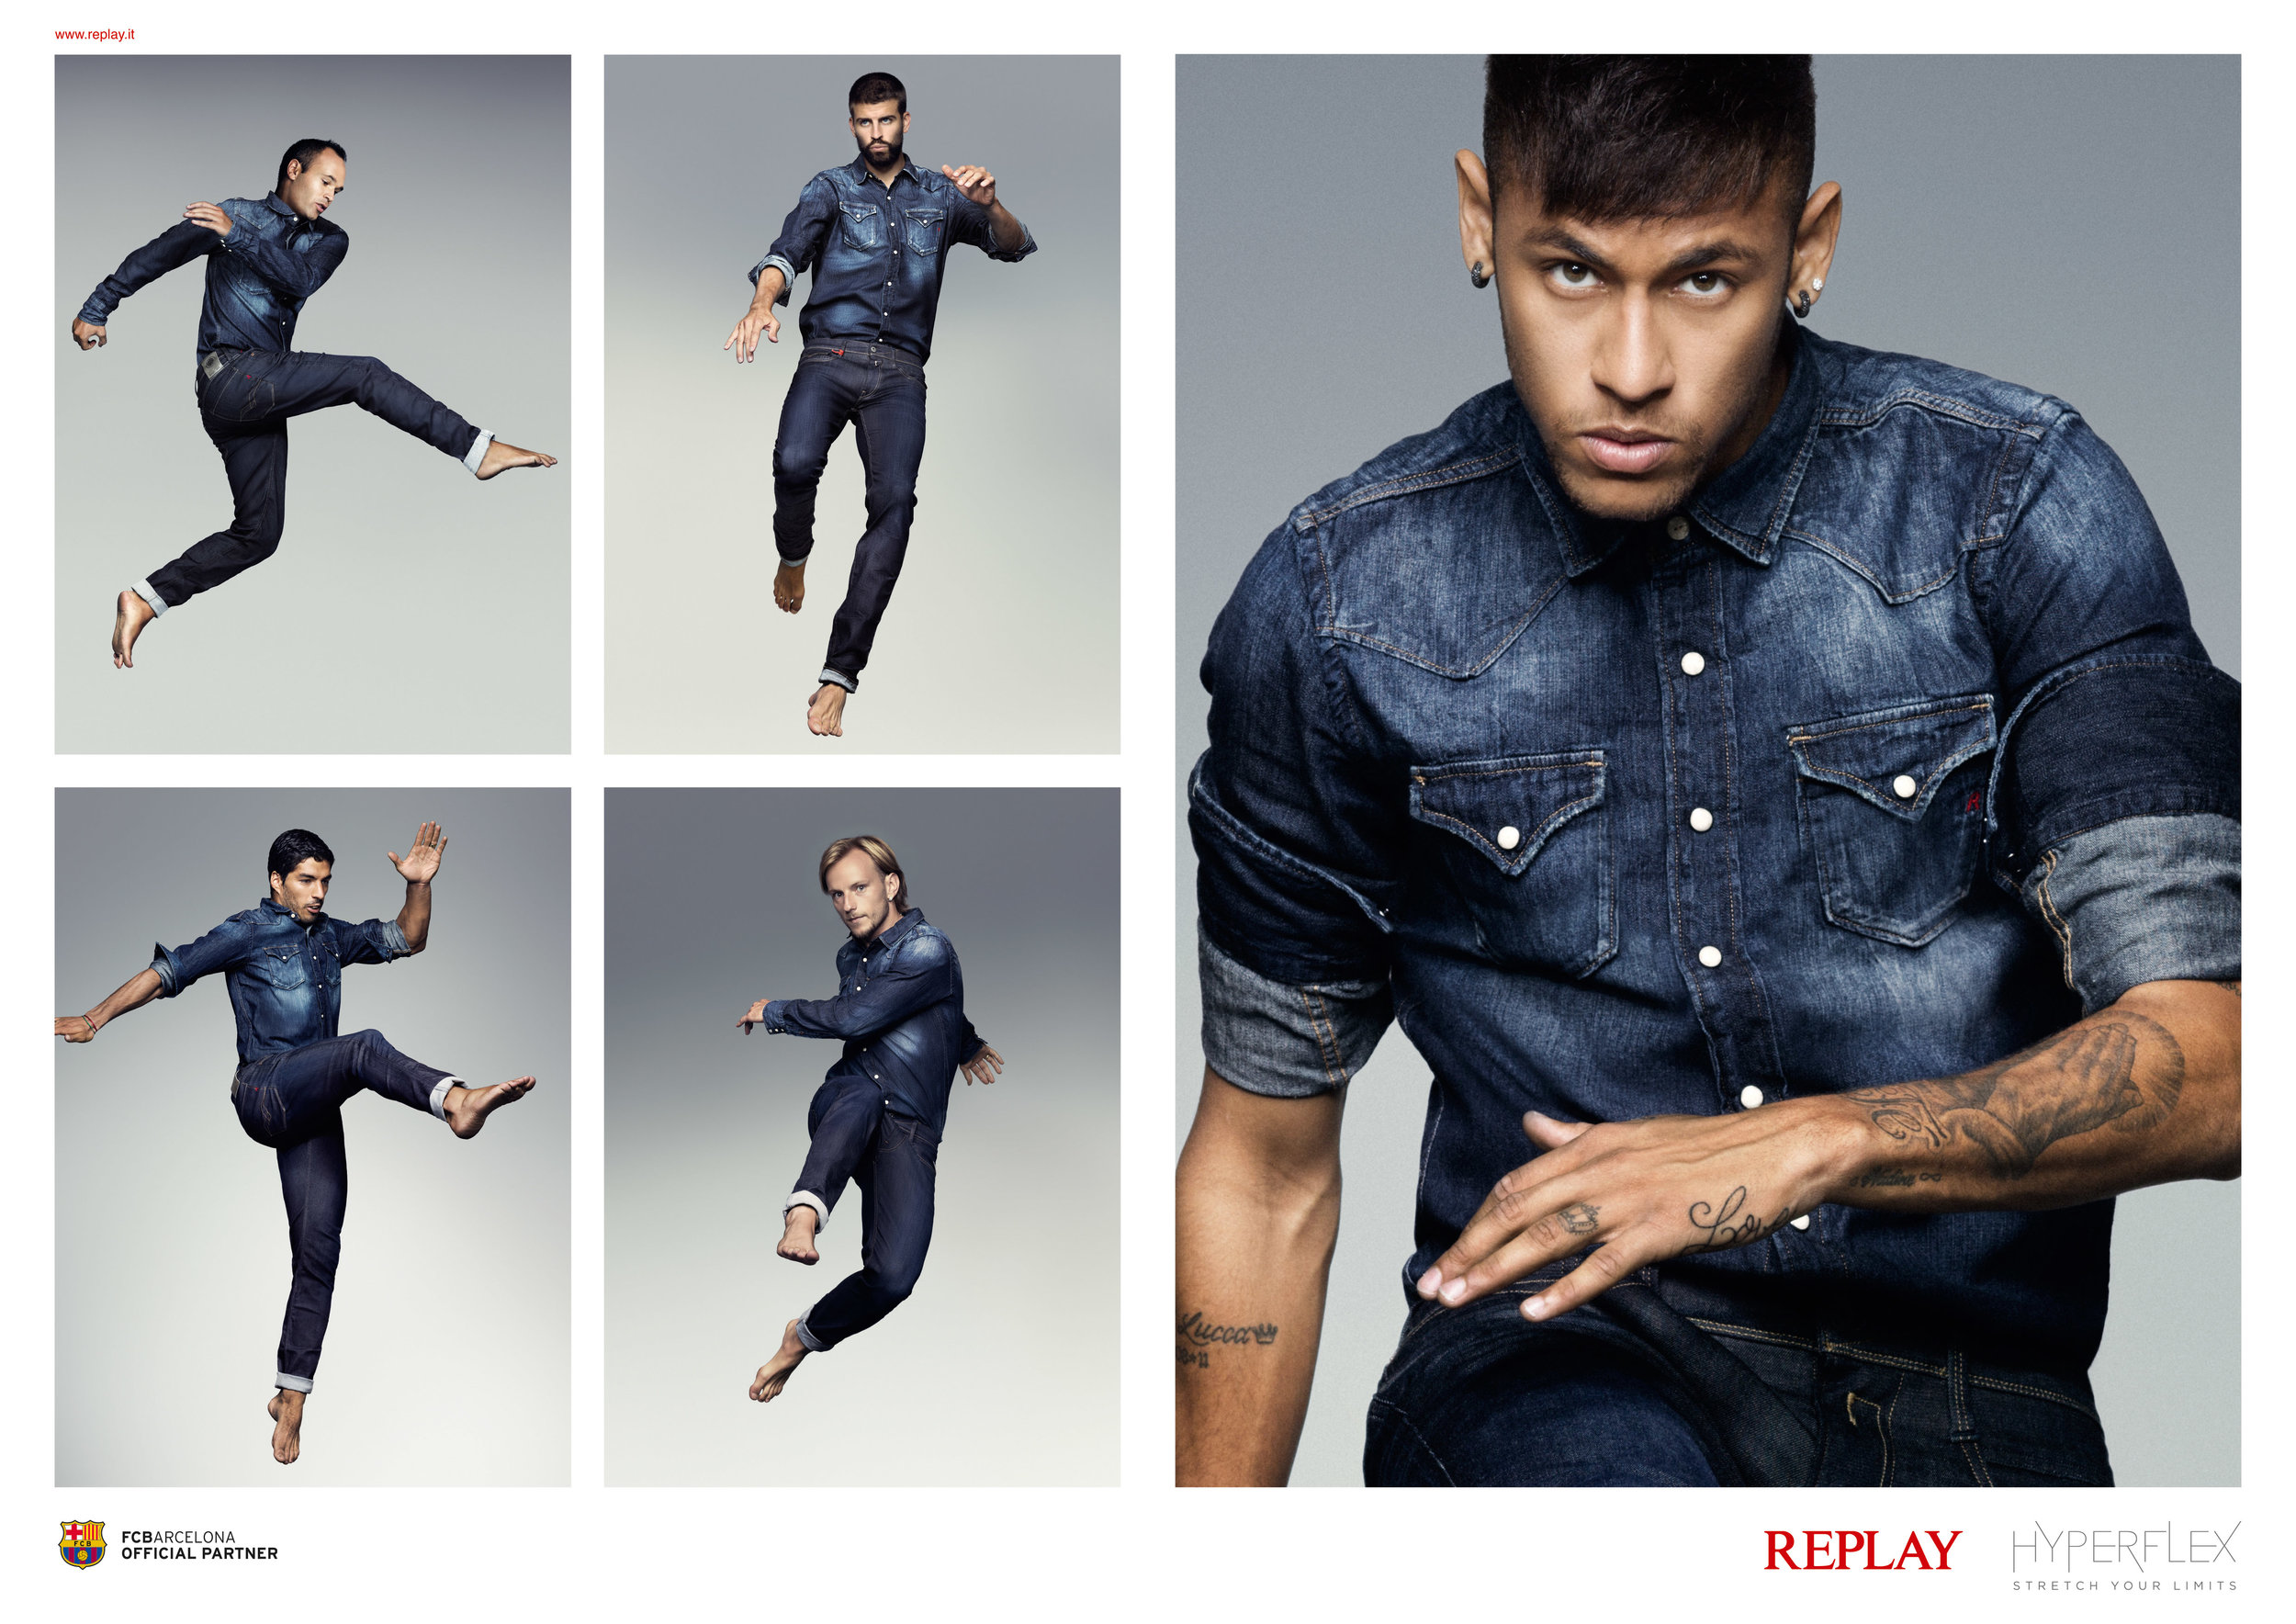 REPLAY_Hyperflex_Neymar_DPS.jpg